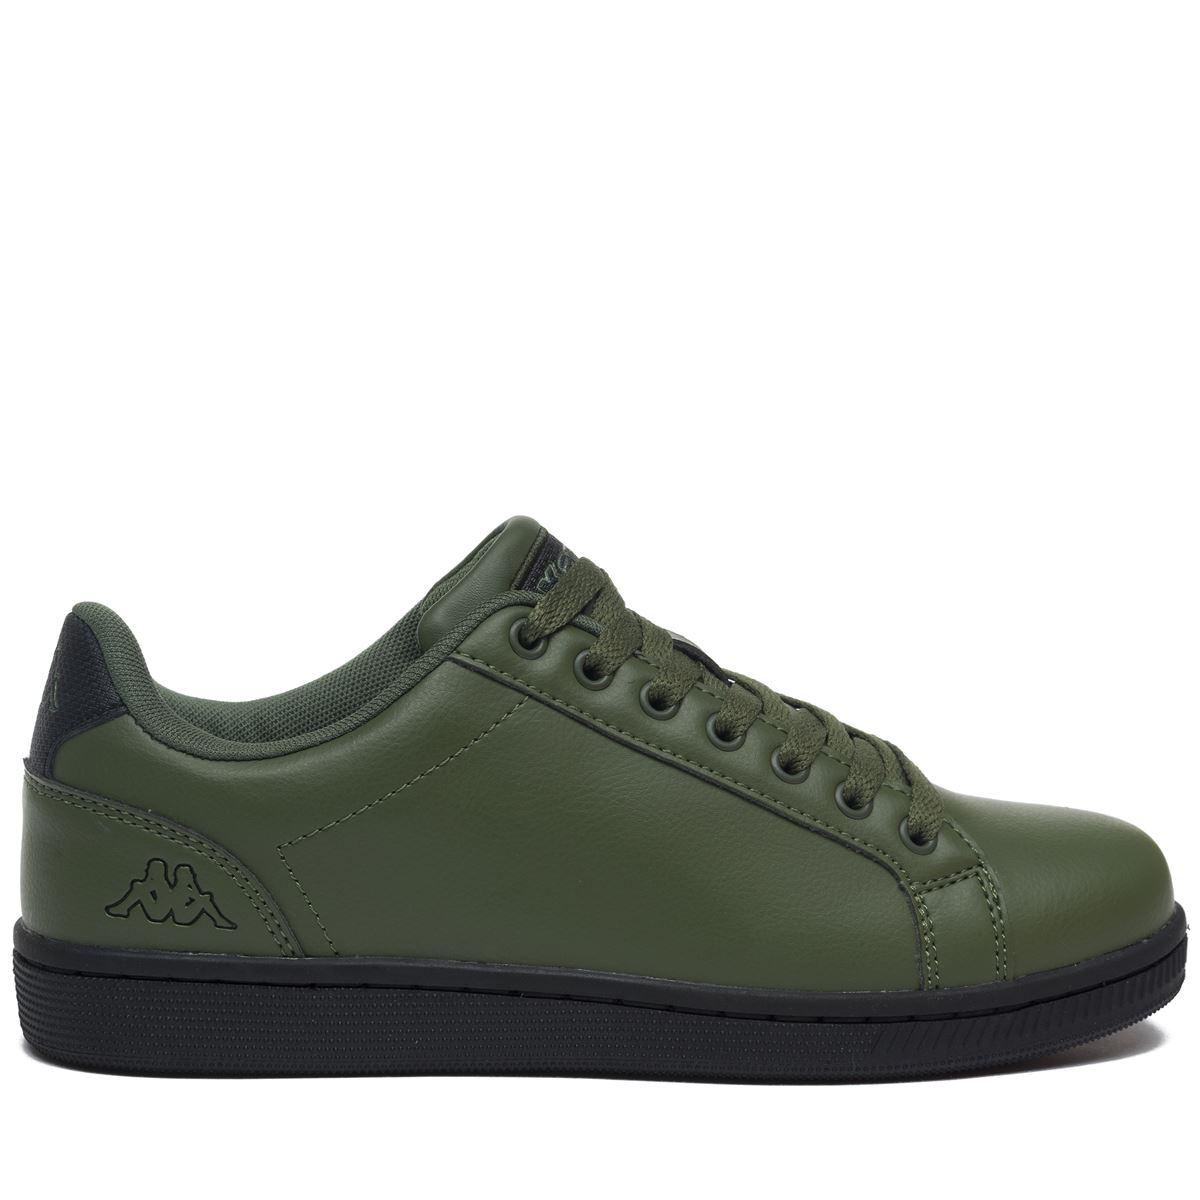 Kappa-Scarpe-Sneakers-Uomo-Donna-LOGO-GALTER-5-Camminata-Basso miniatuur 4